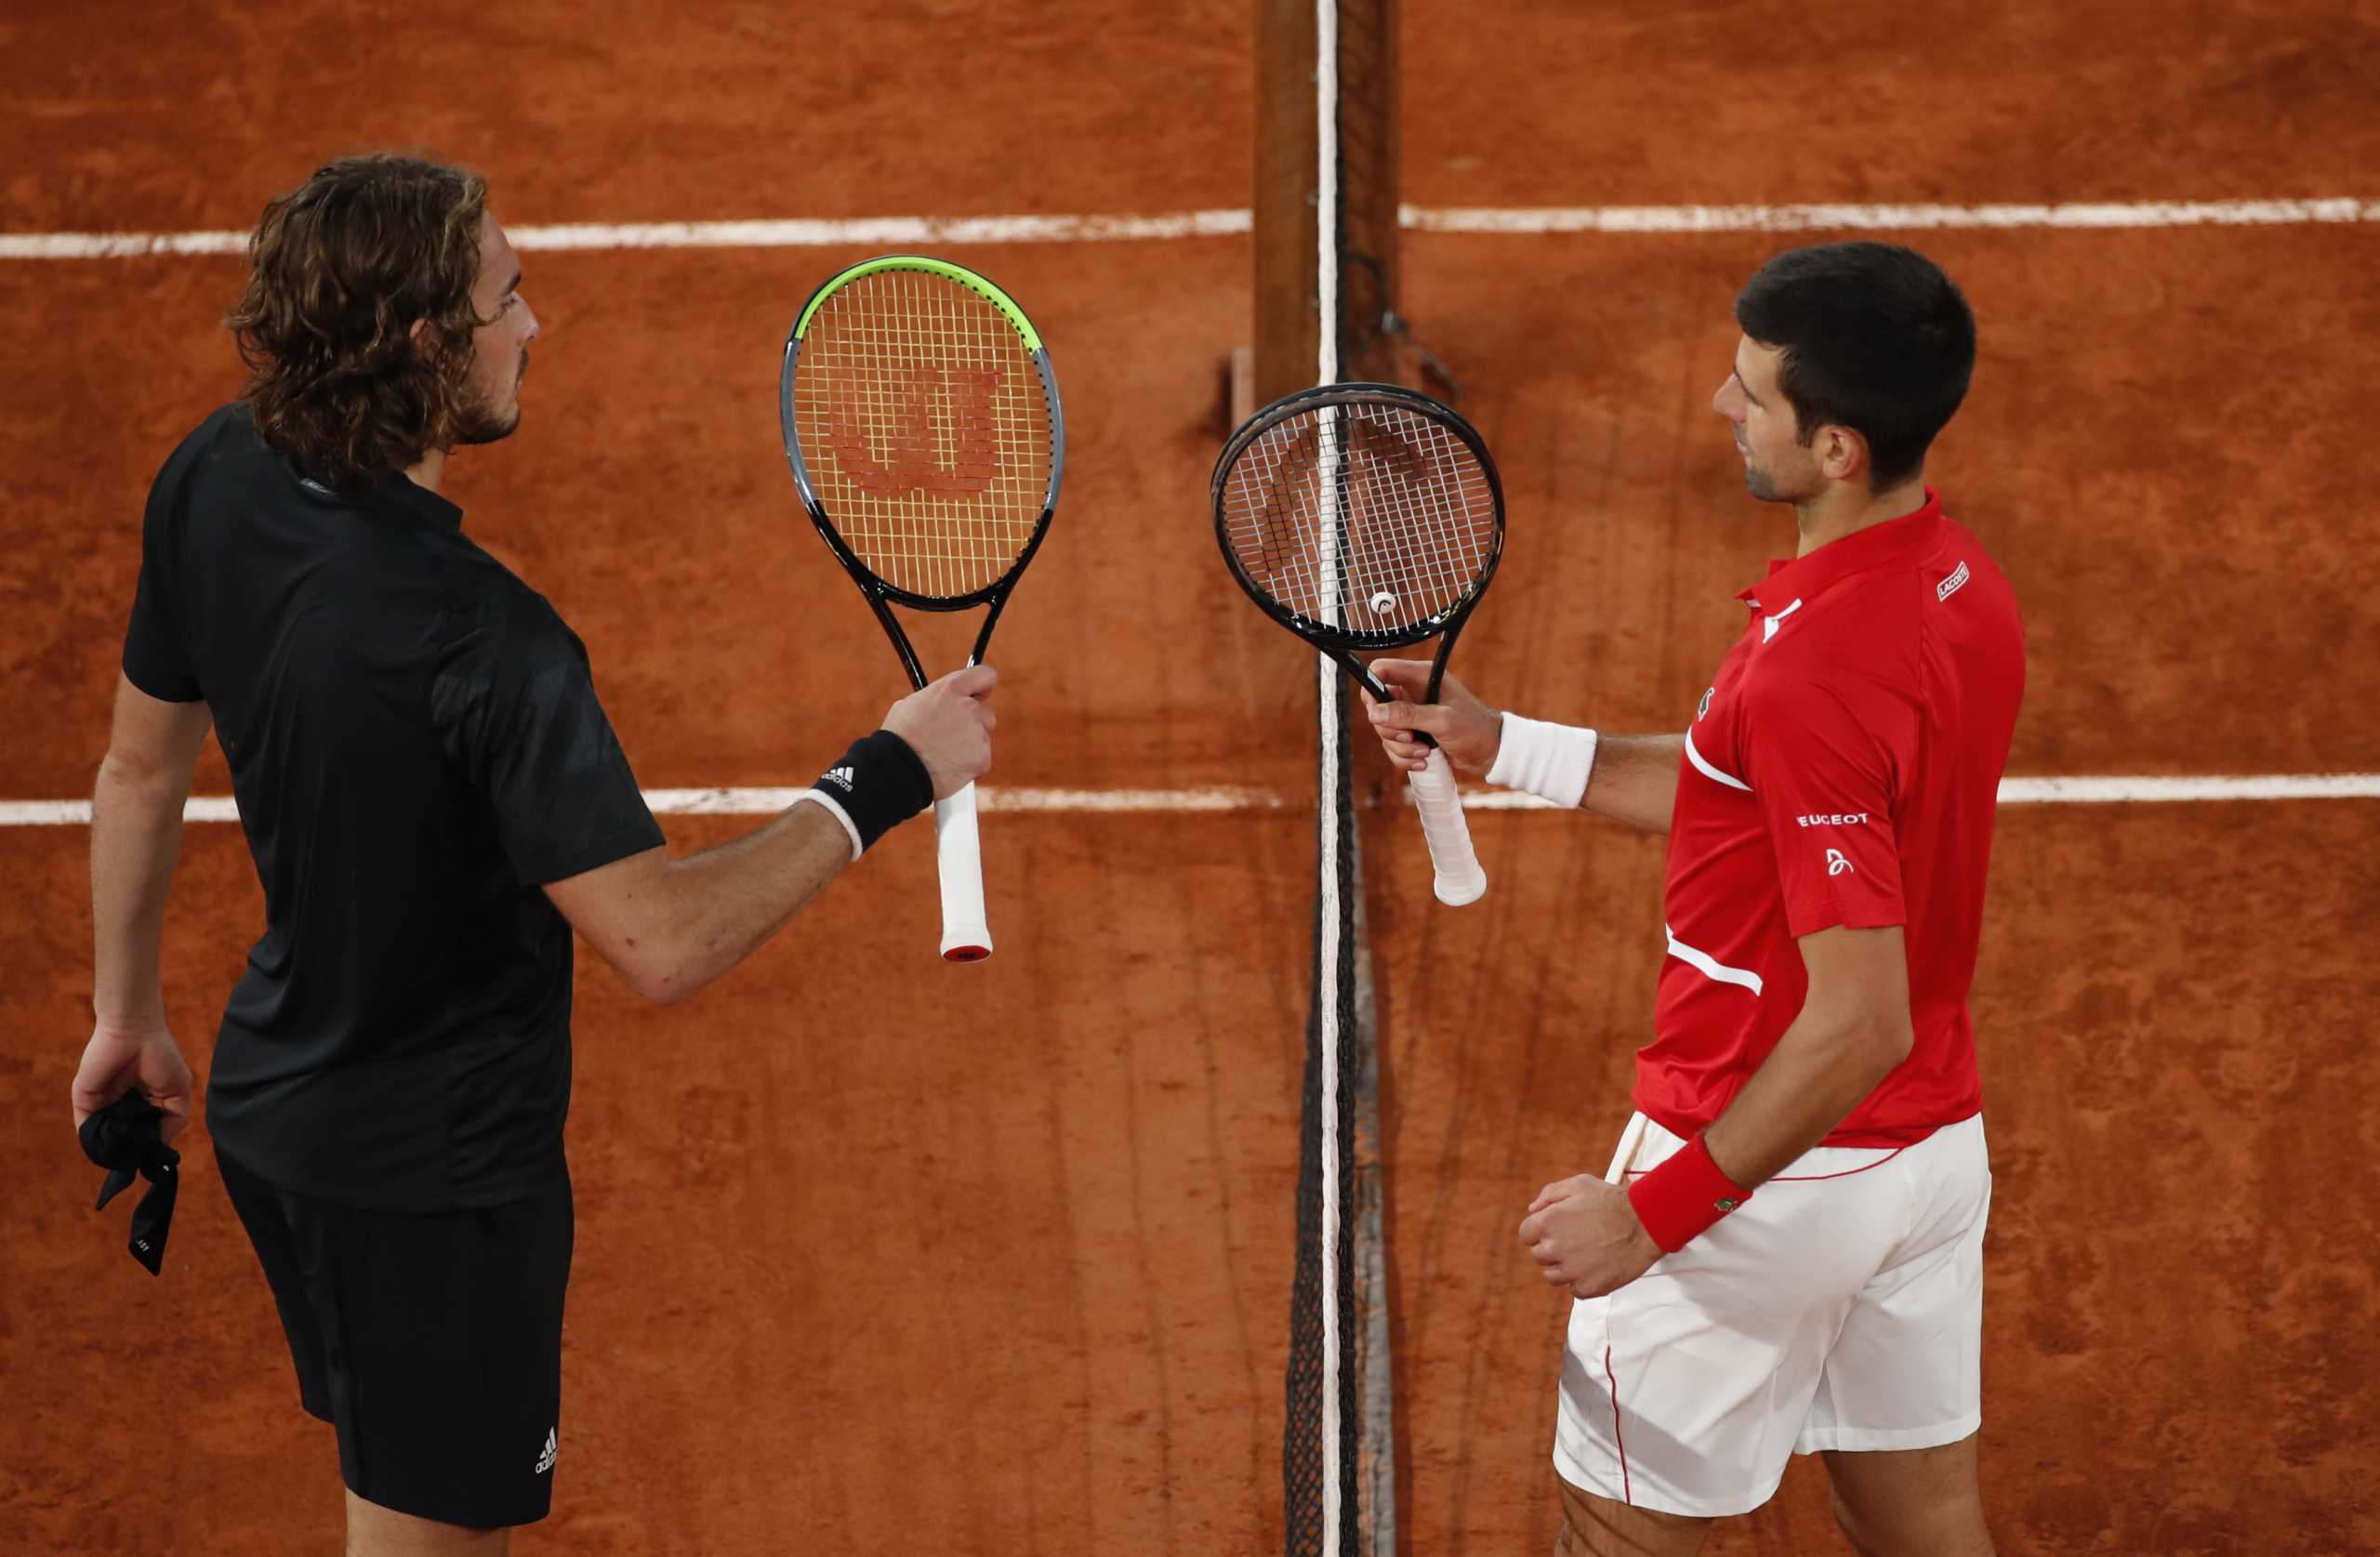 Tennis - French Open - Roland Garros, Paris, France - October 9, 2020 Serbia's Novak Djokovic  after winning his semi final match against Greece's Stefanos Tsitsipas REUTERS/Gonzalo Fuentes